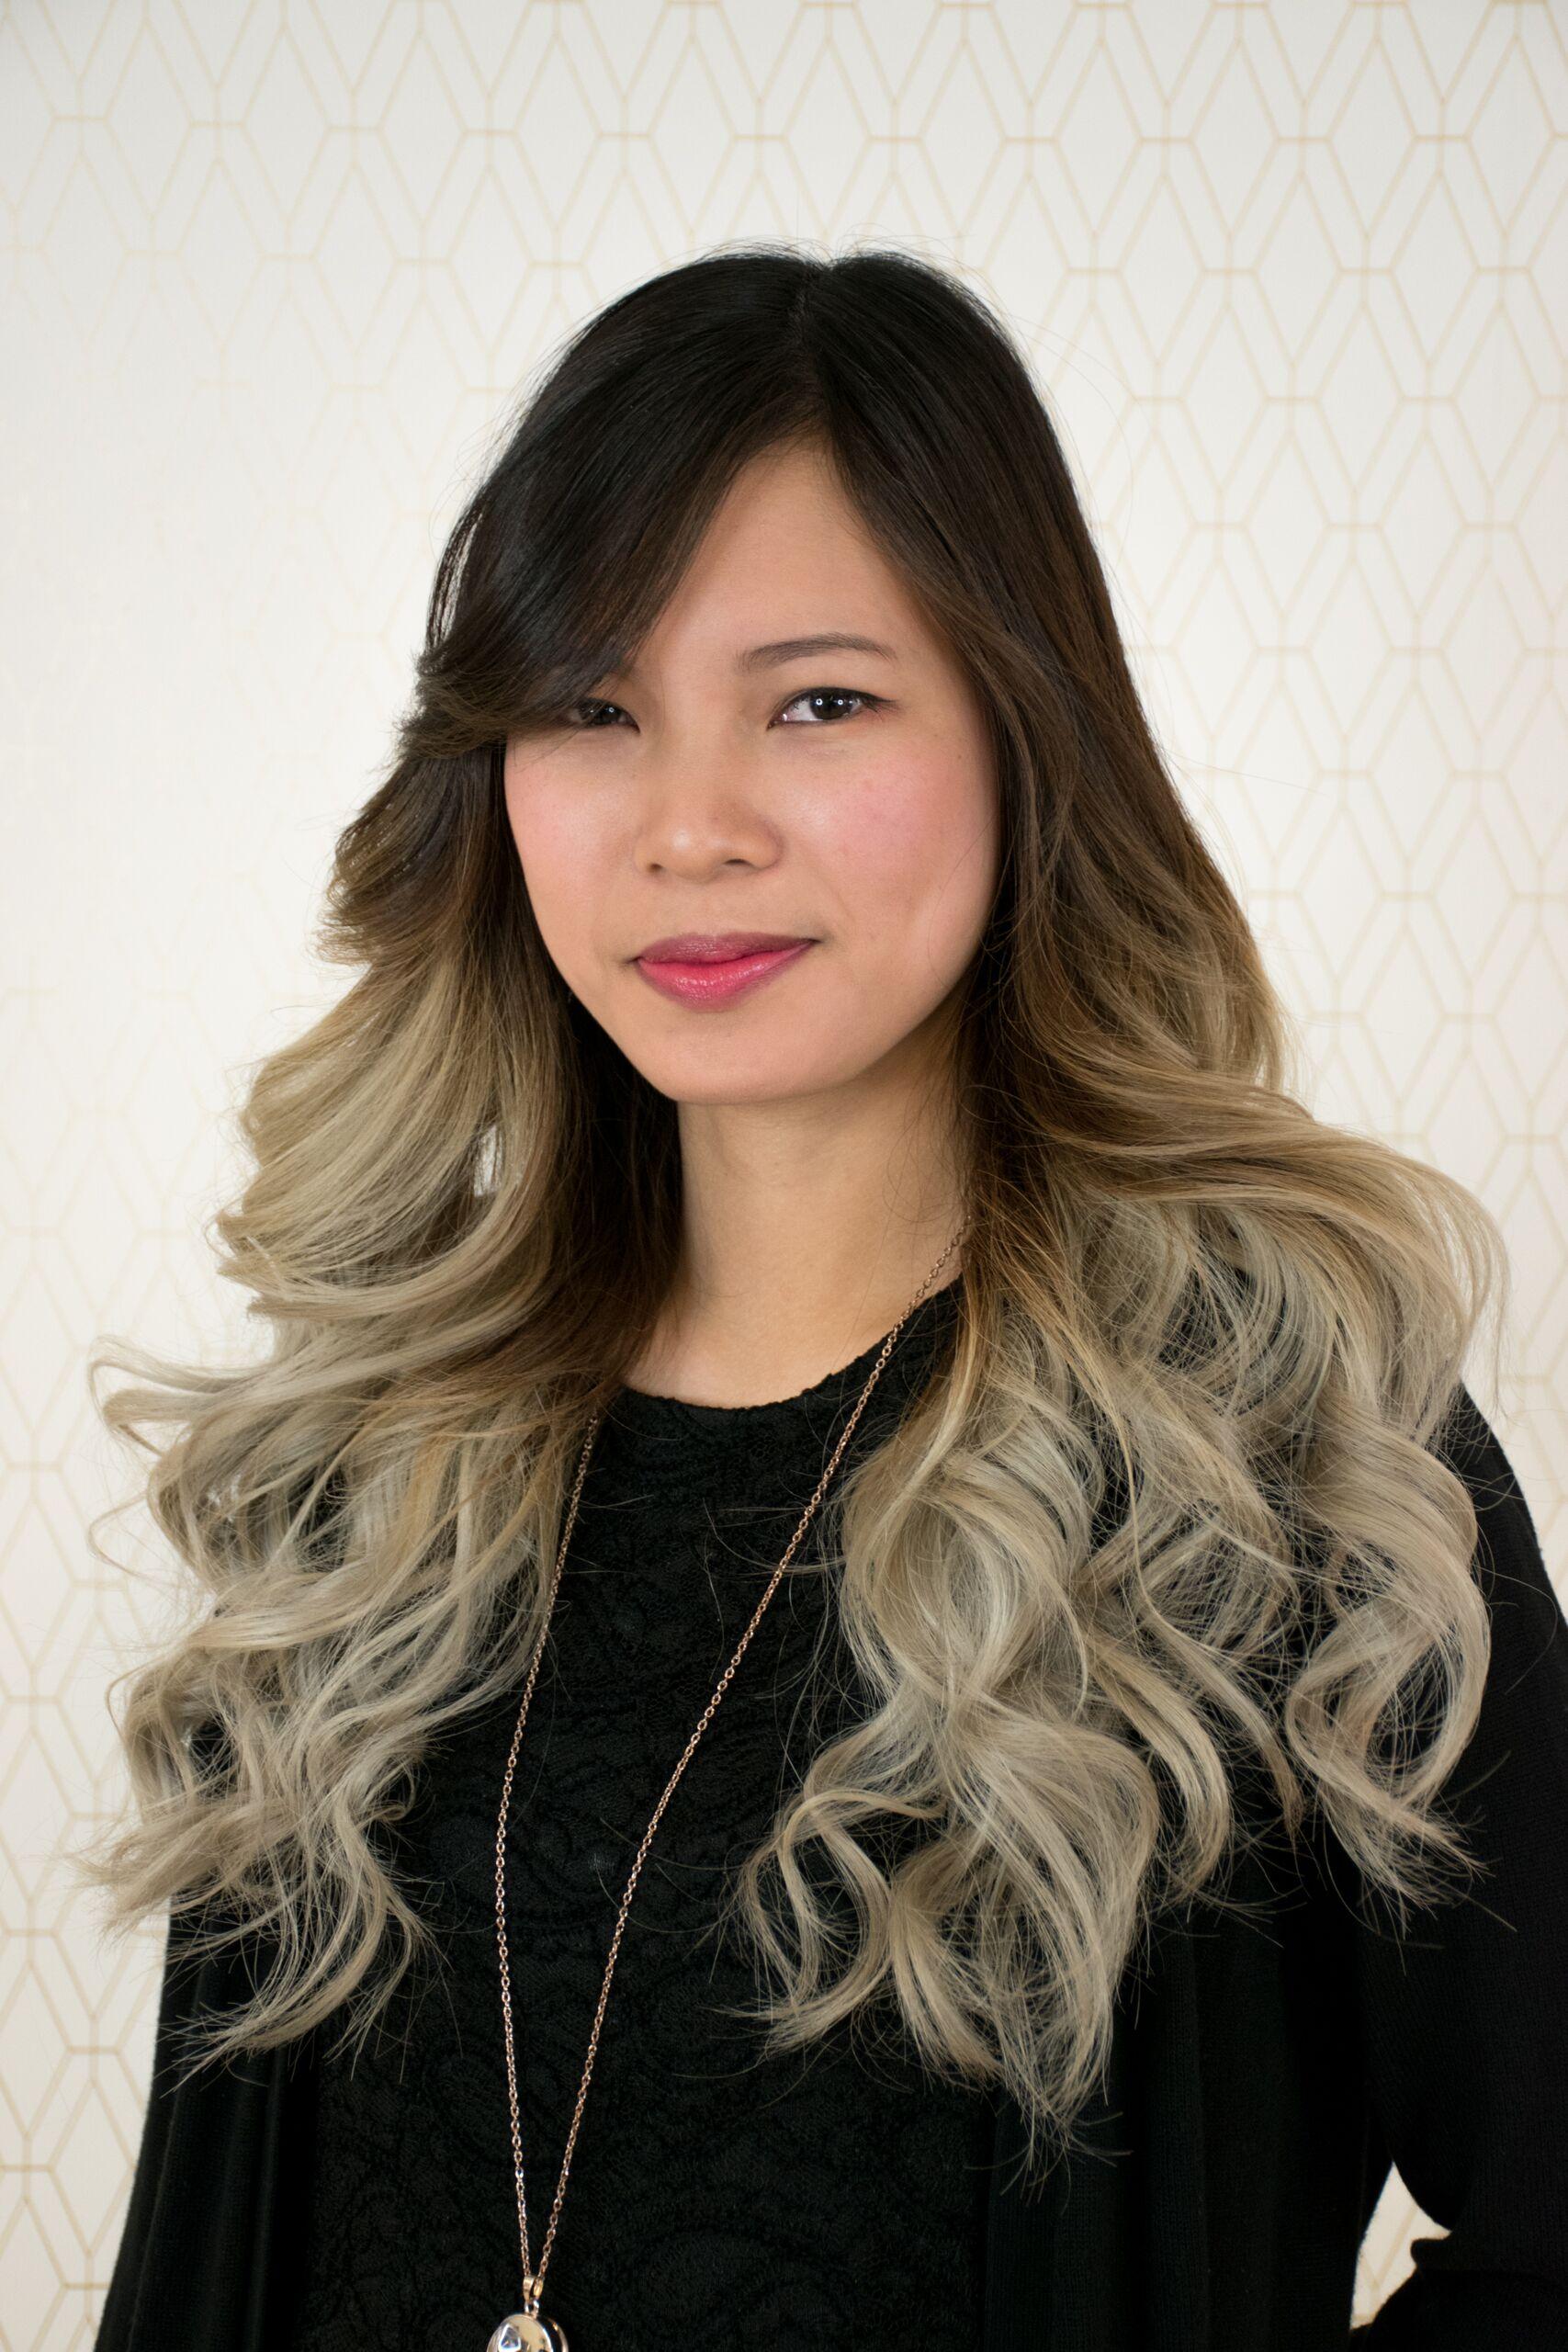 Elizabeth Leong - Graduate Stylist@elzbth.hair